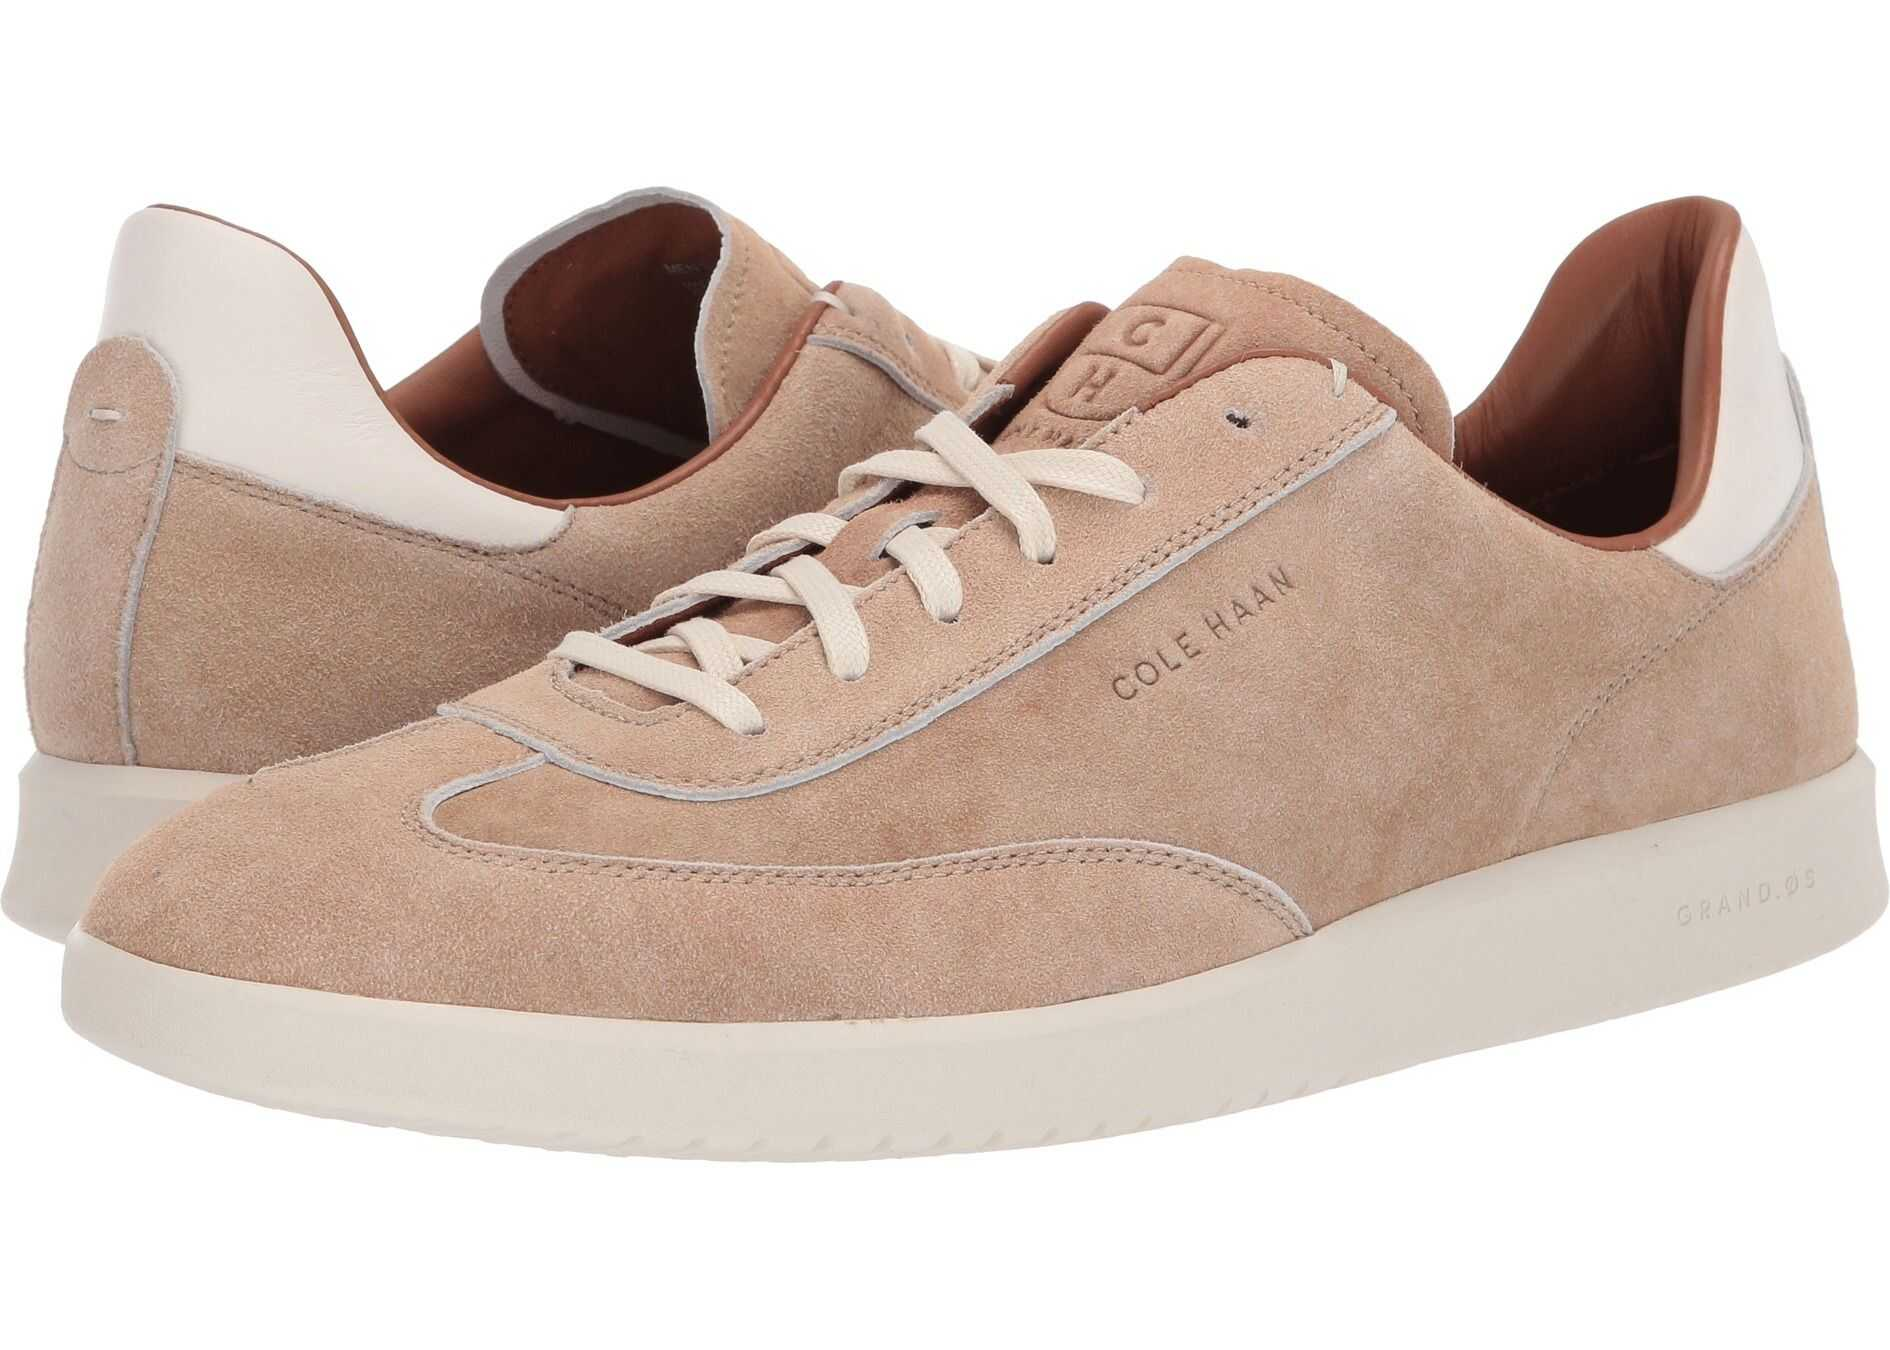 Cole Haan Grandpro Turf Sneaker Dusty Pink Suede